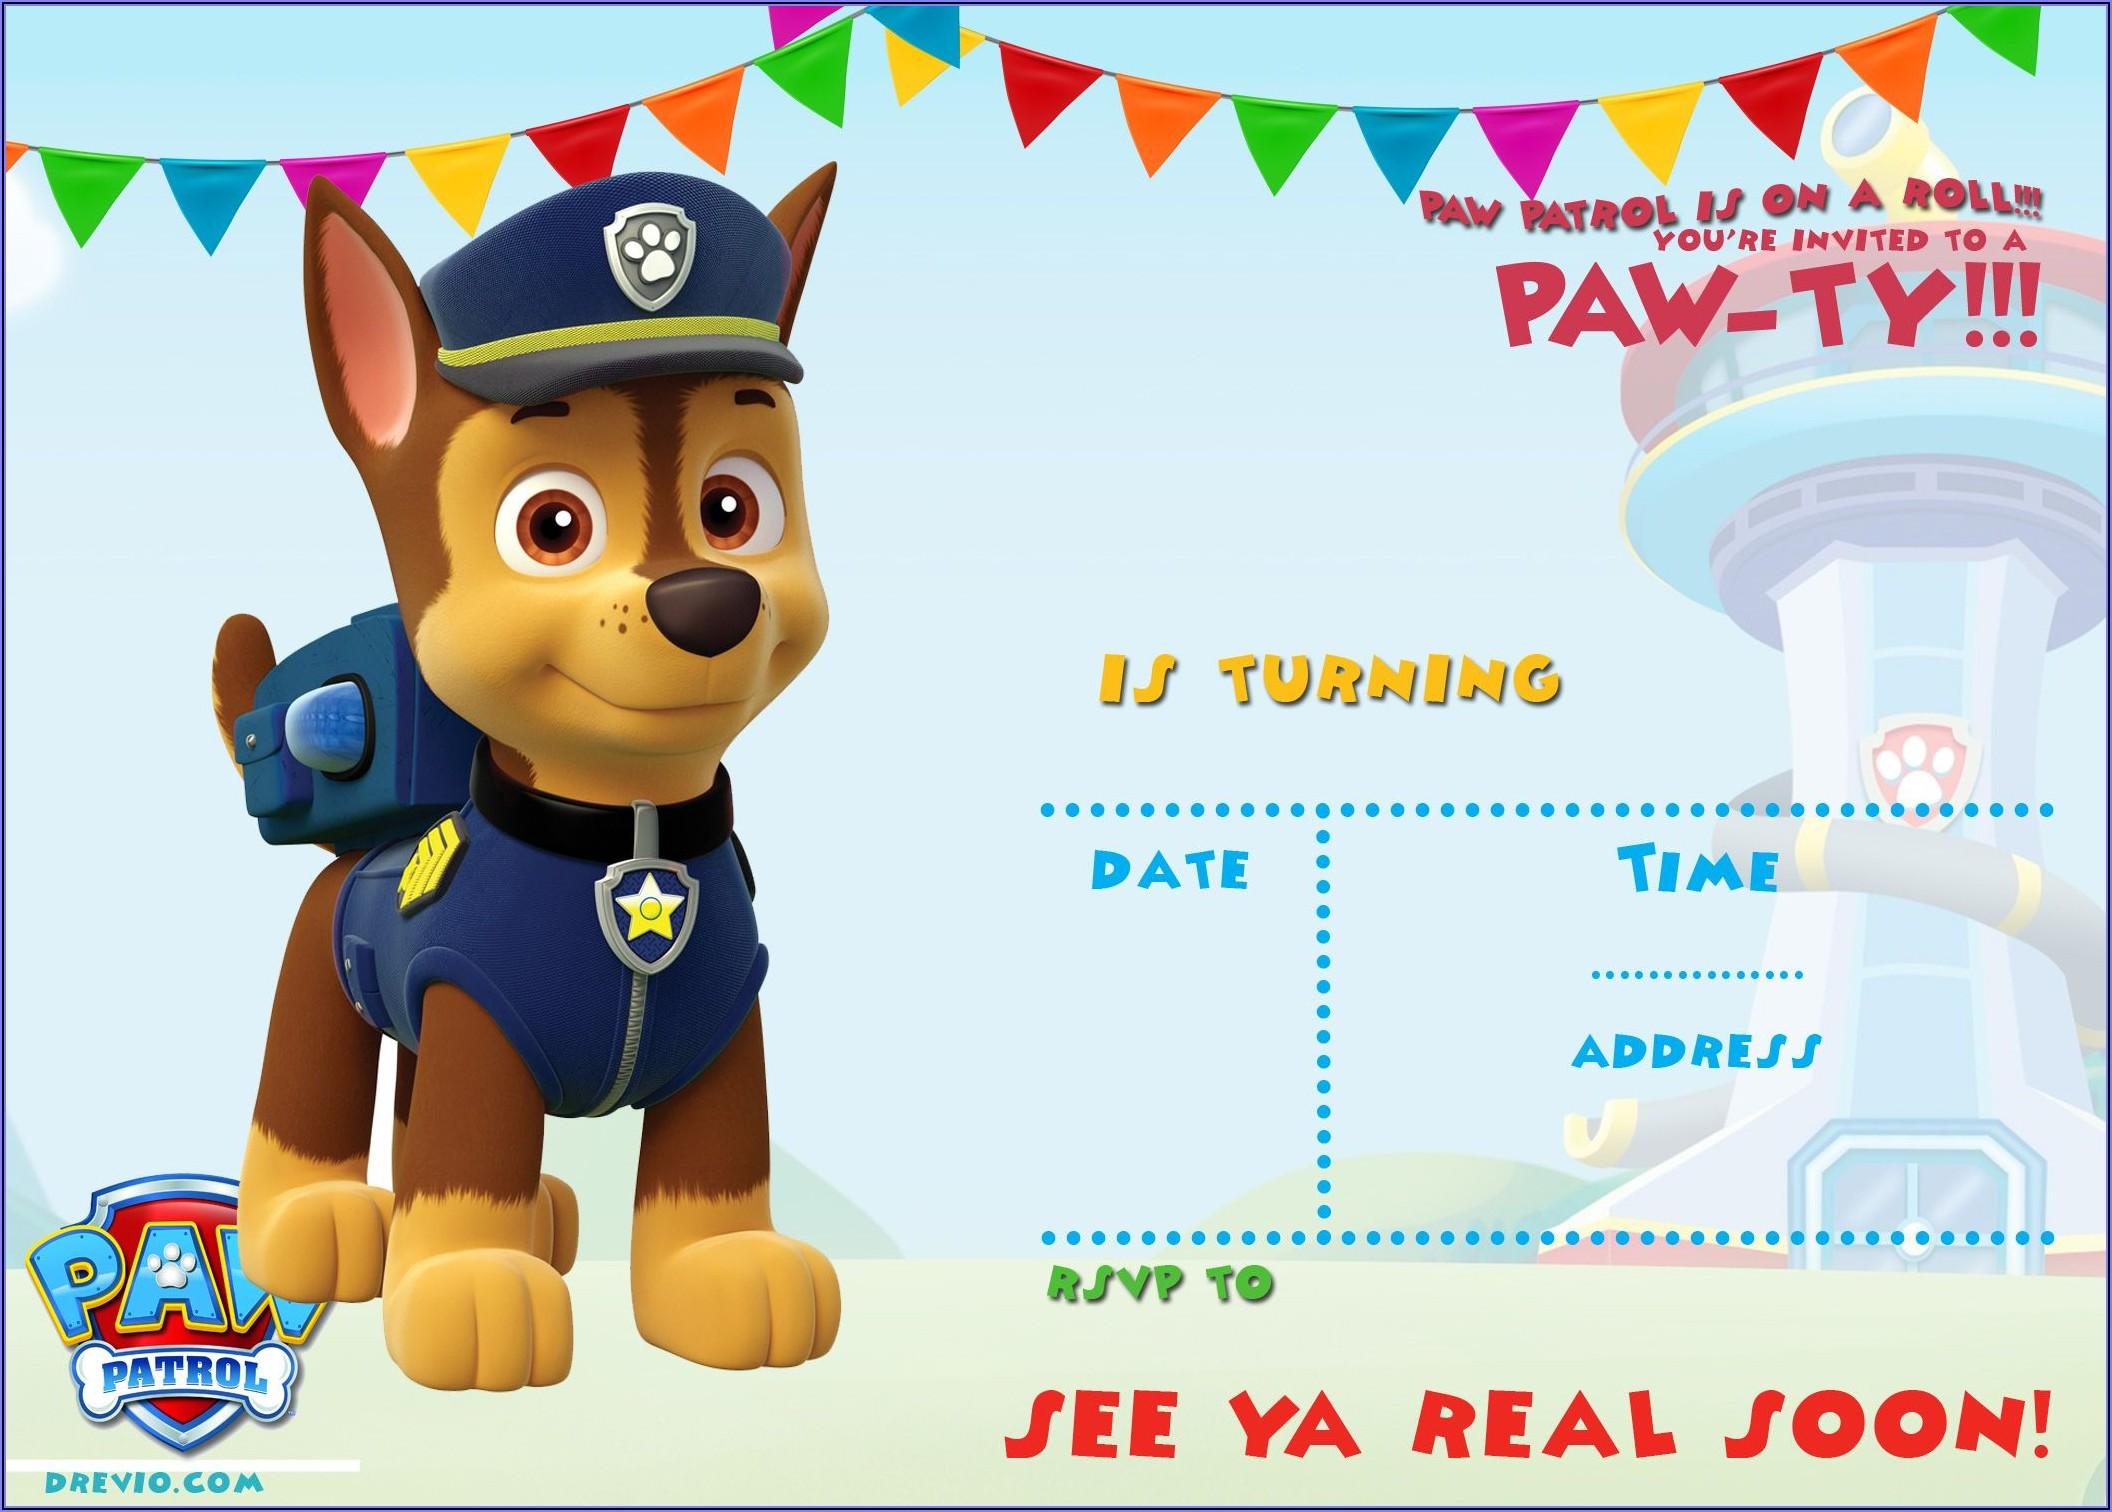 Paw Patrol Free Printable Invitation Template